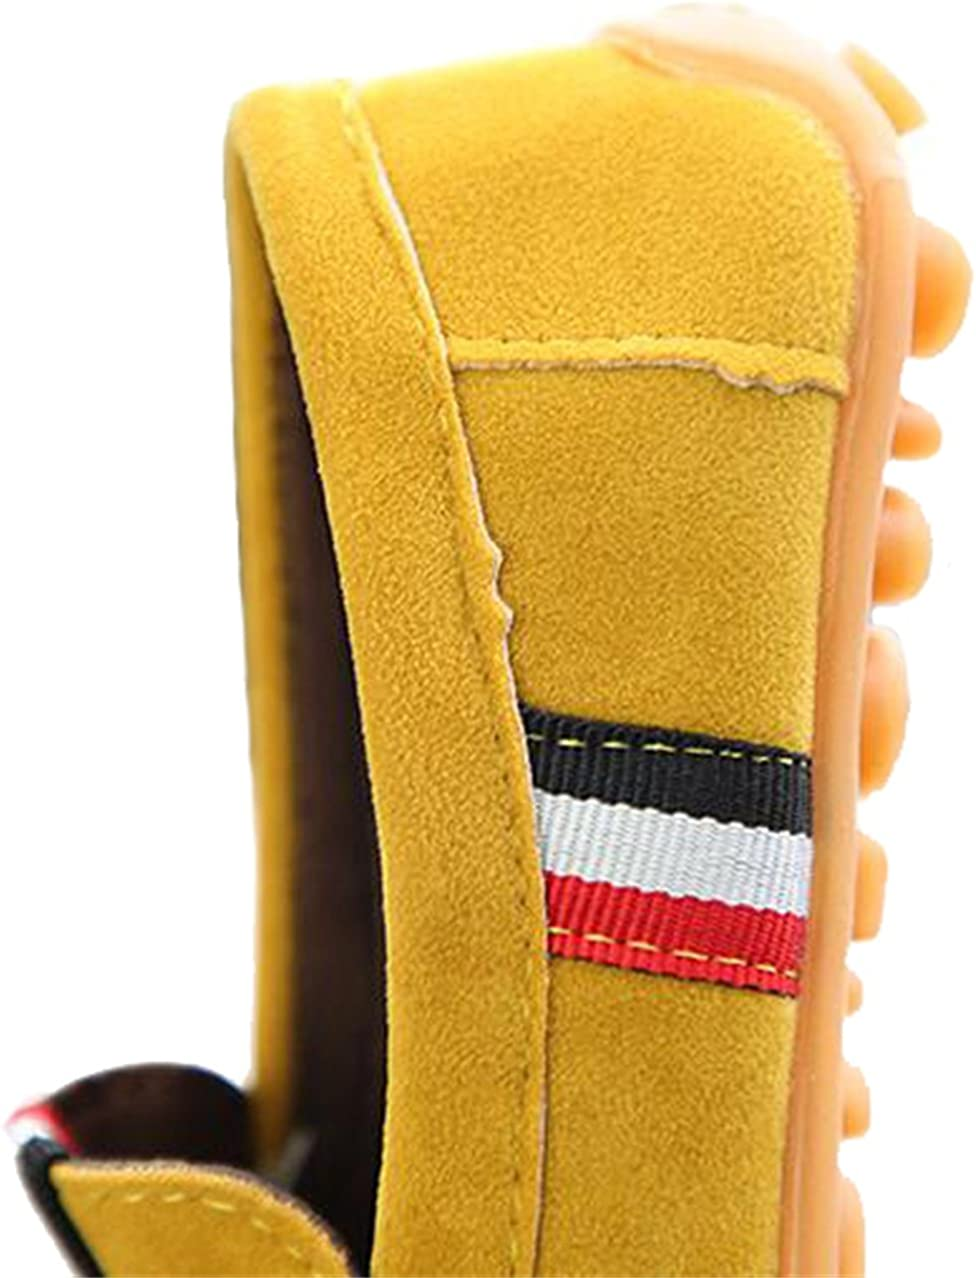 PPXID Mixte Enfant Chaussure Bateau Loisirs Confort Plates Loafers Chaussures